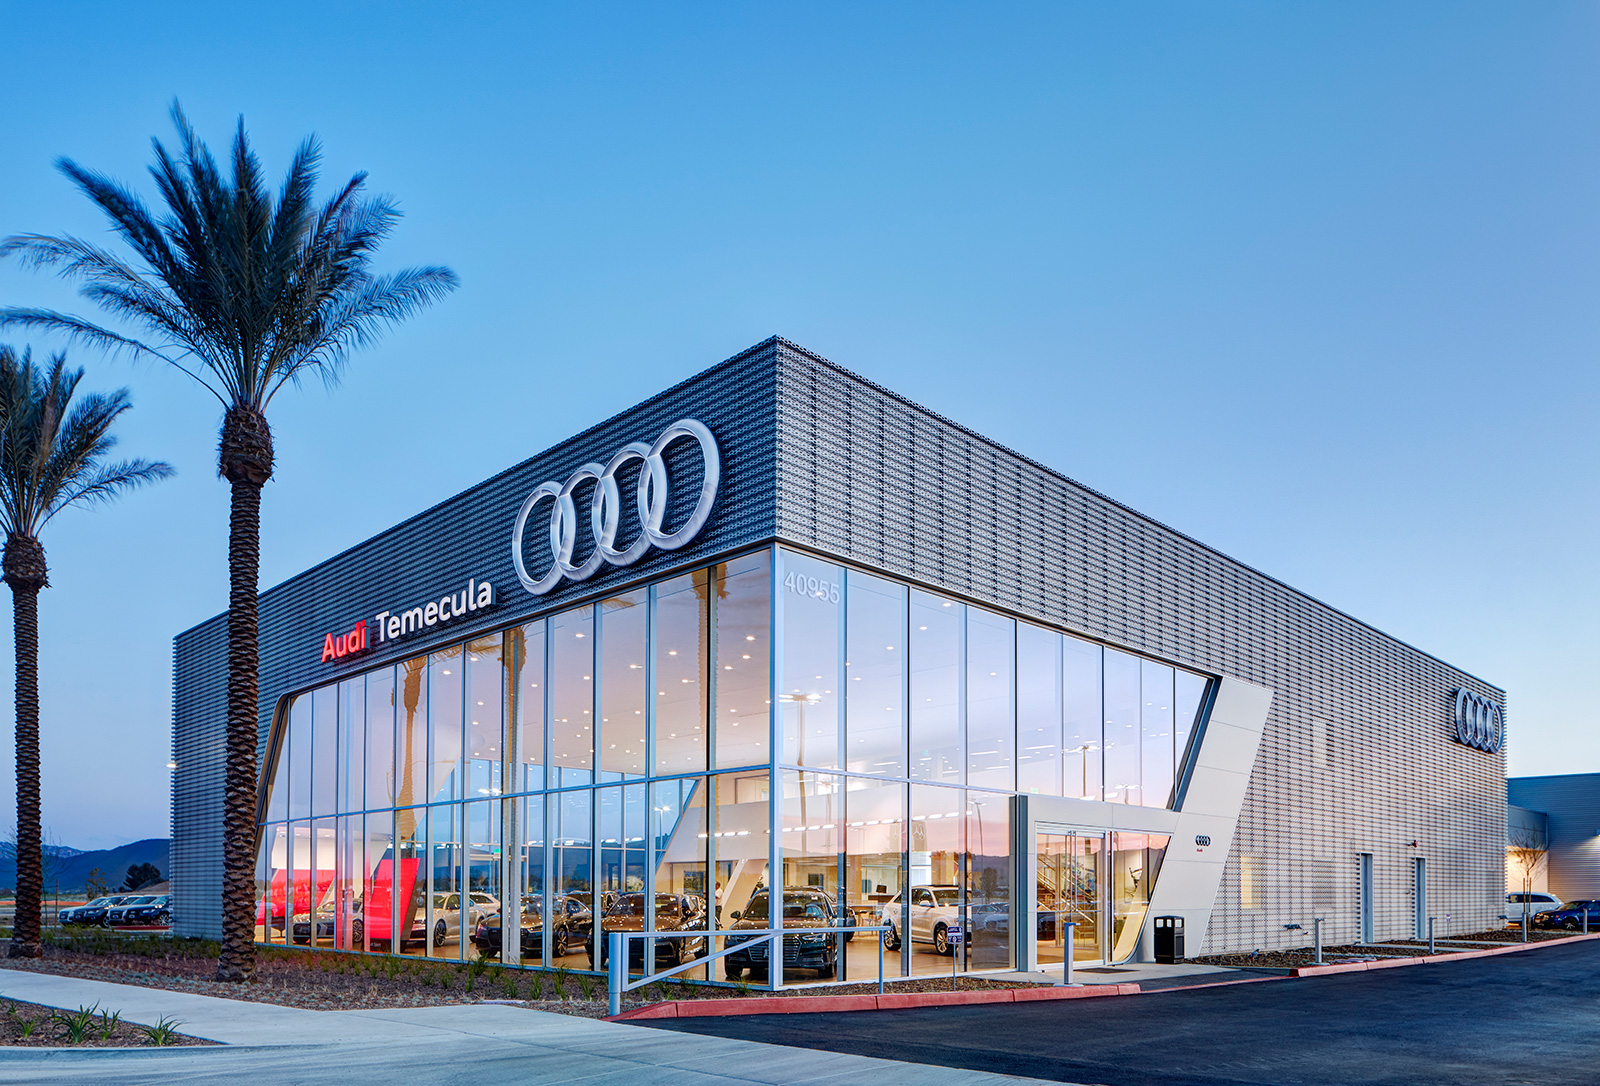 Hoehn Audi Temecula Dempsey Construction